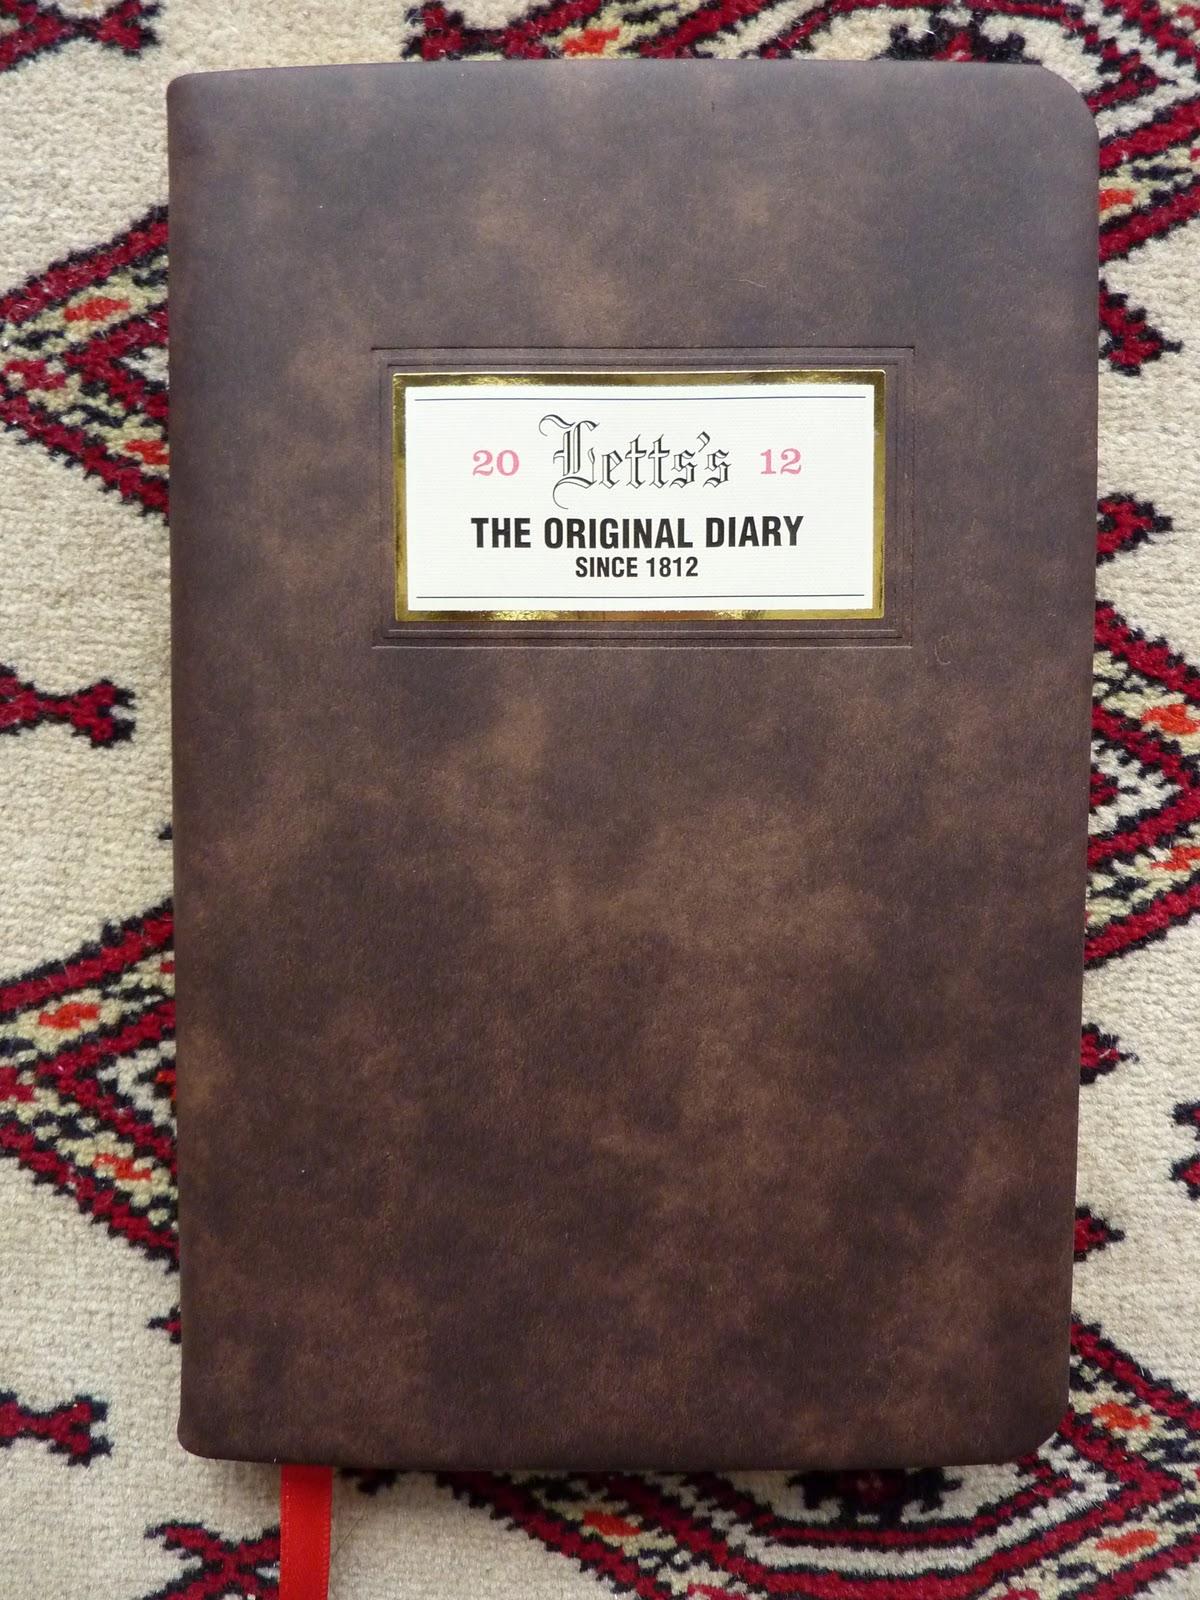 Letts Bicentenary Diary